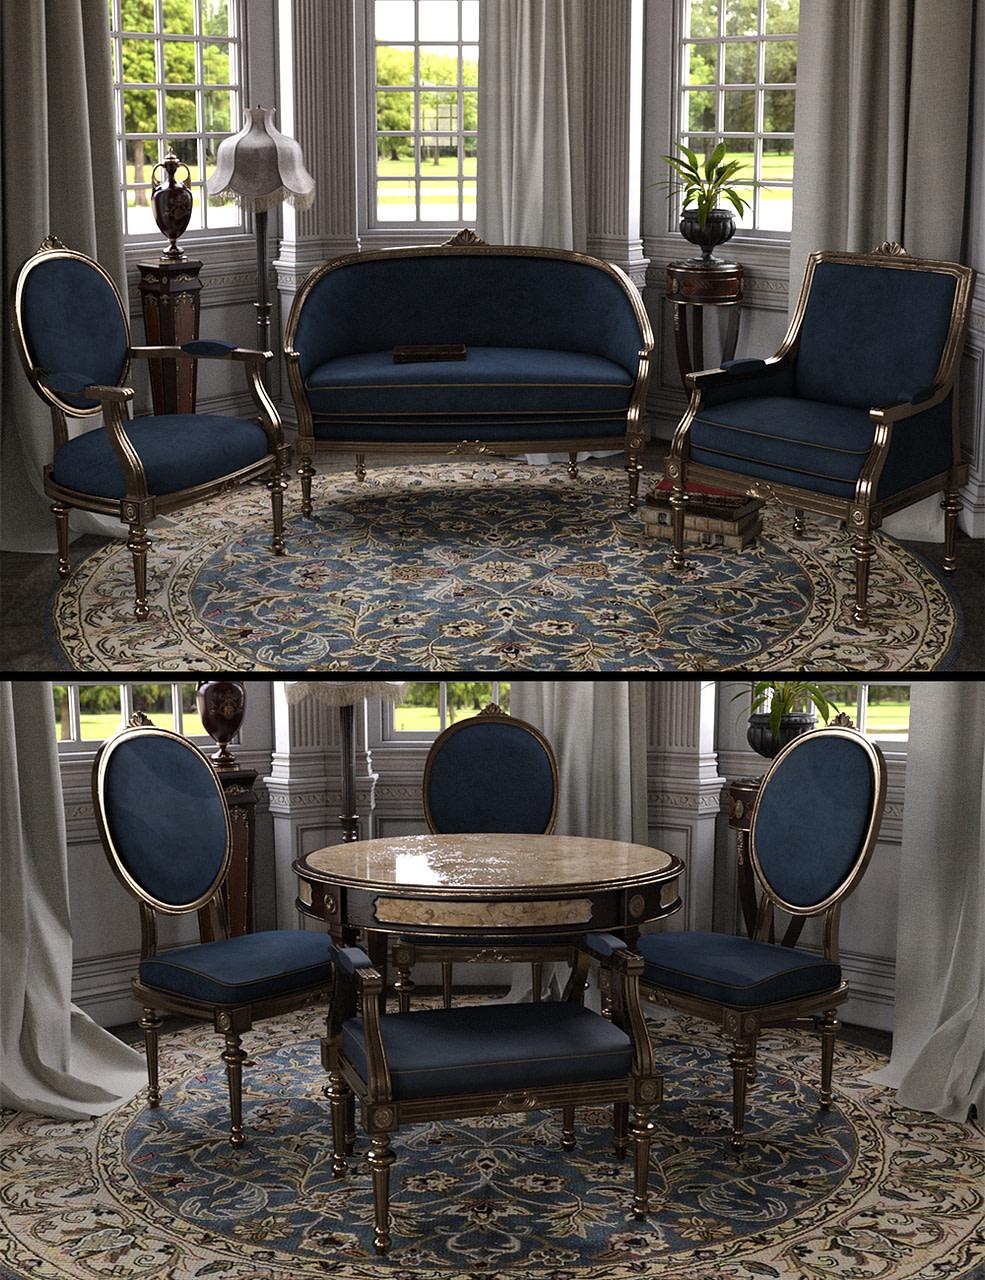 daz3d vintage furniture iray